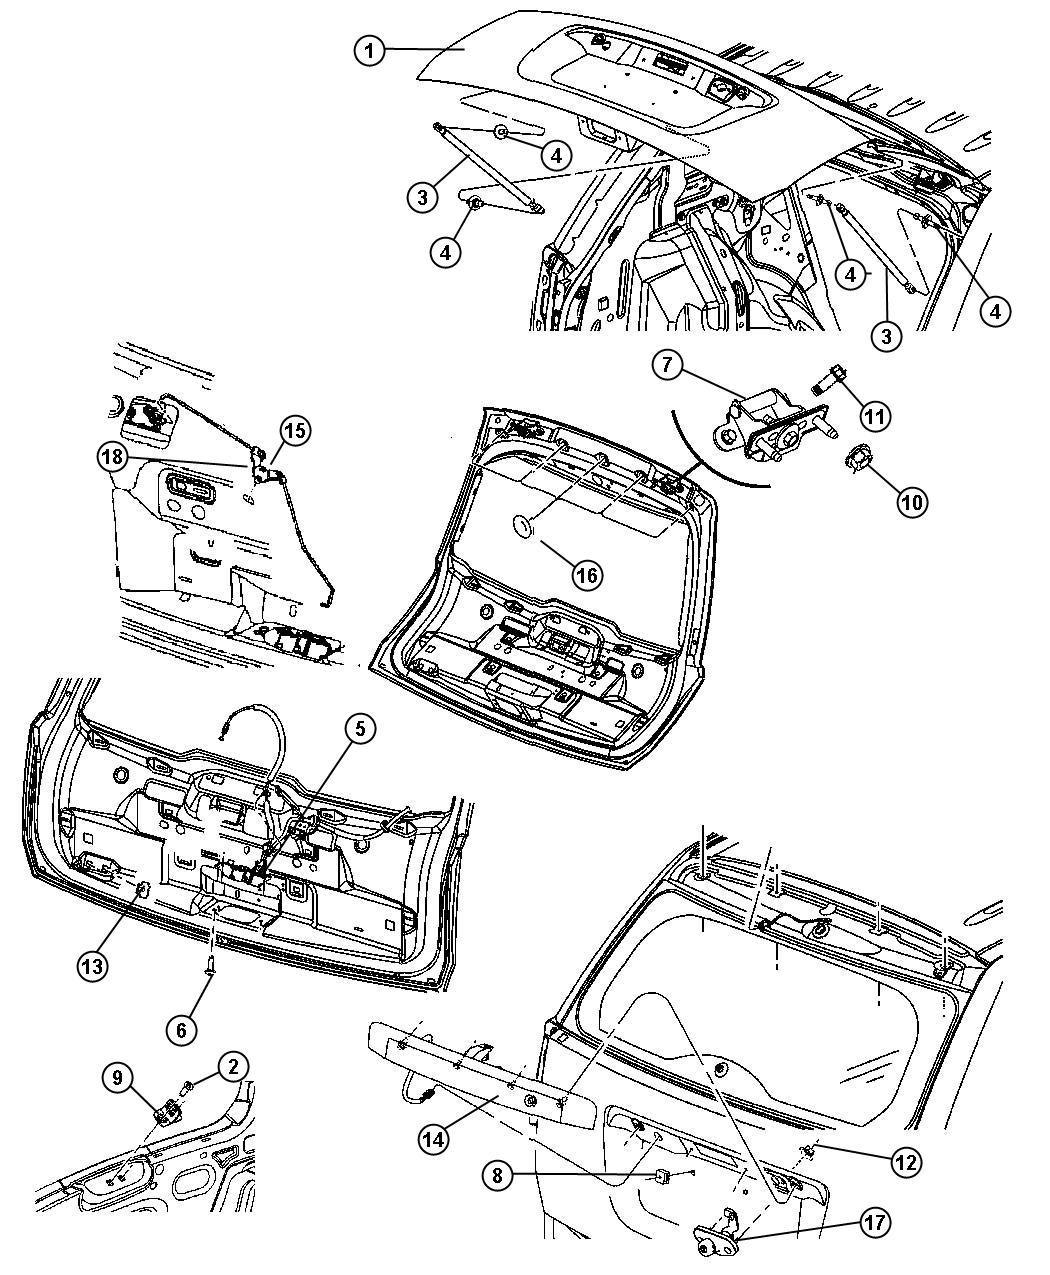 2009 Jeep Compass Latch. Liftgate. Locks, manual, door